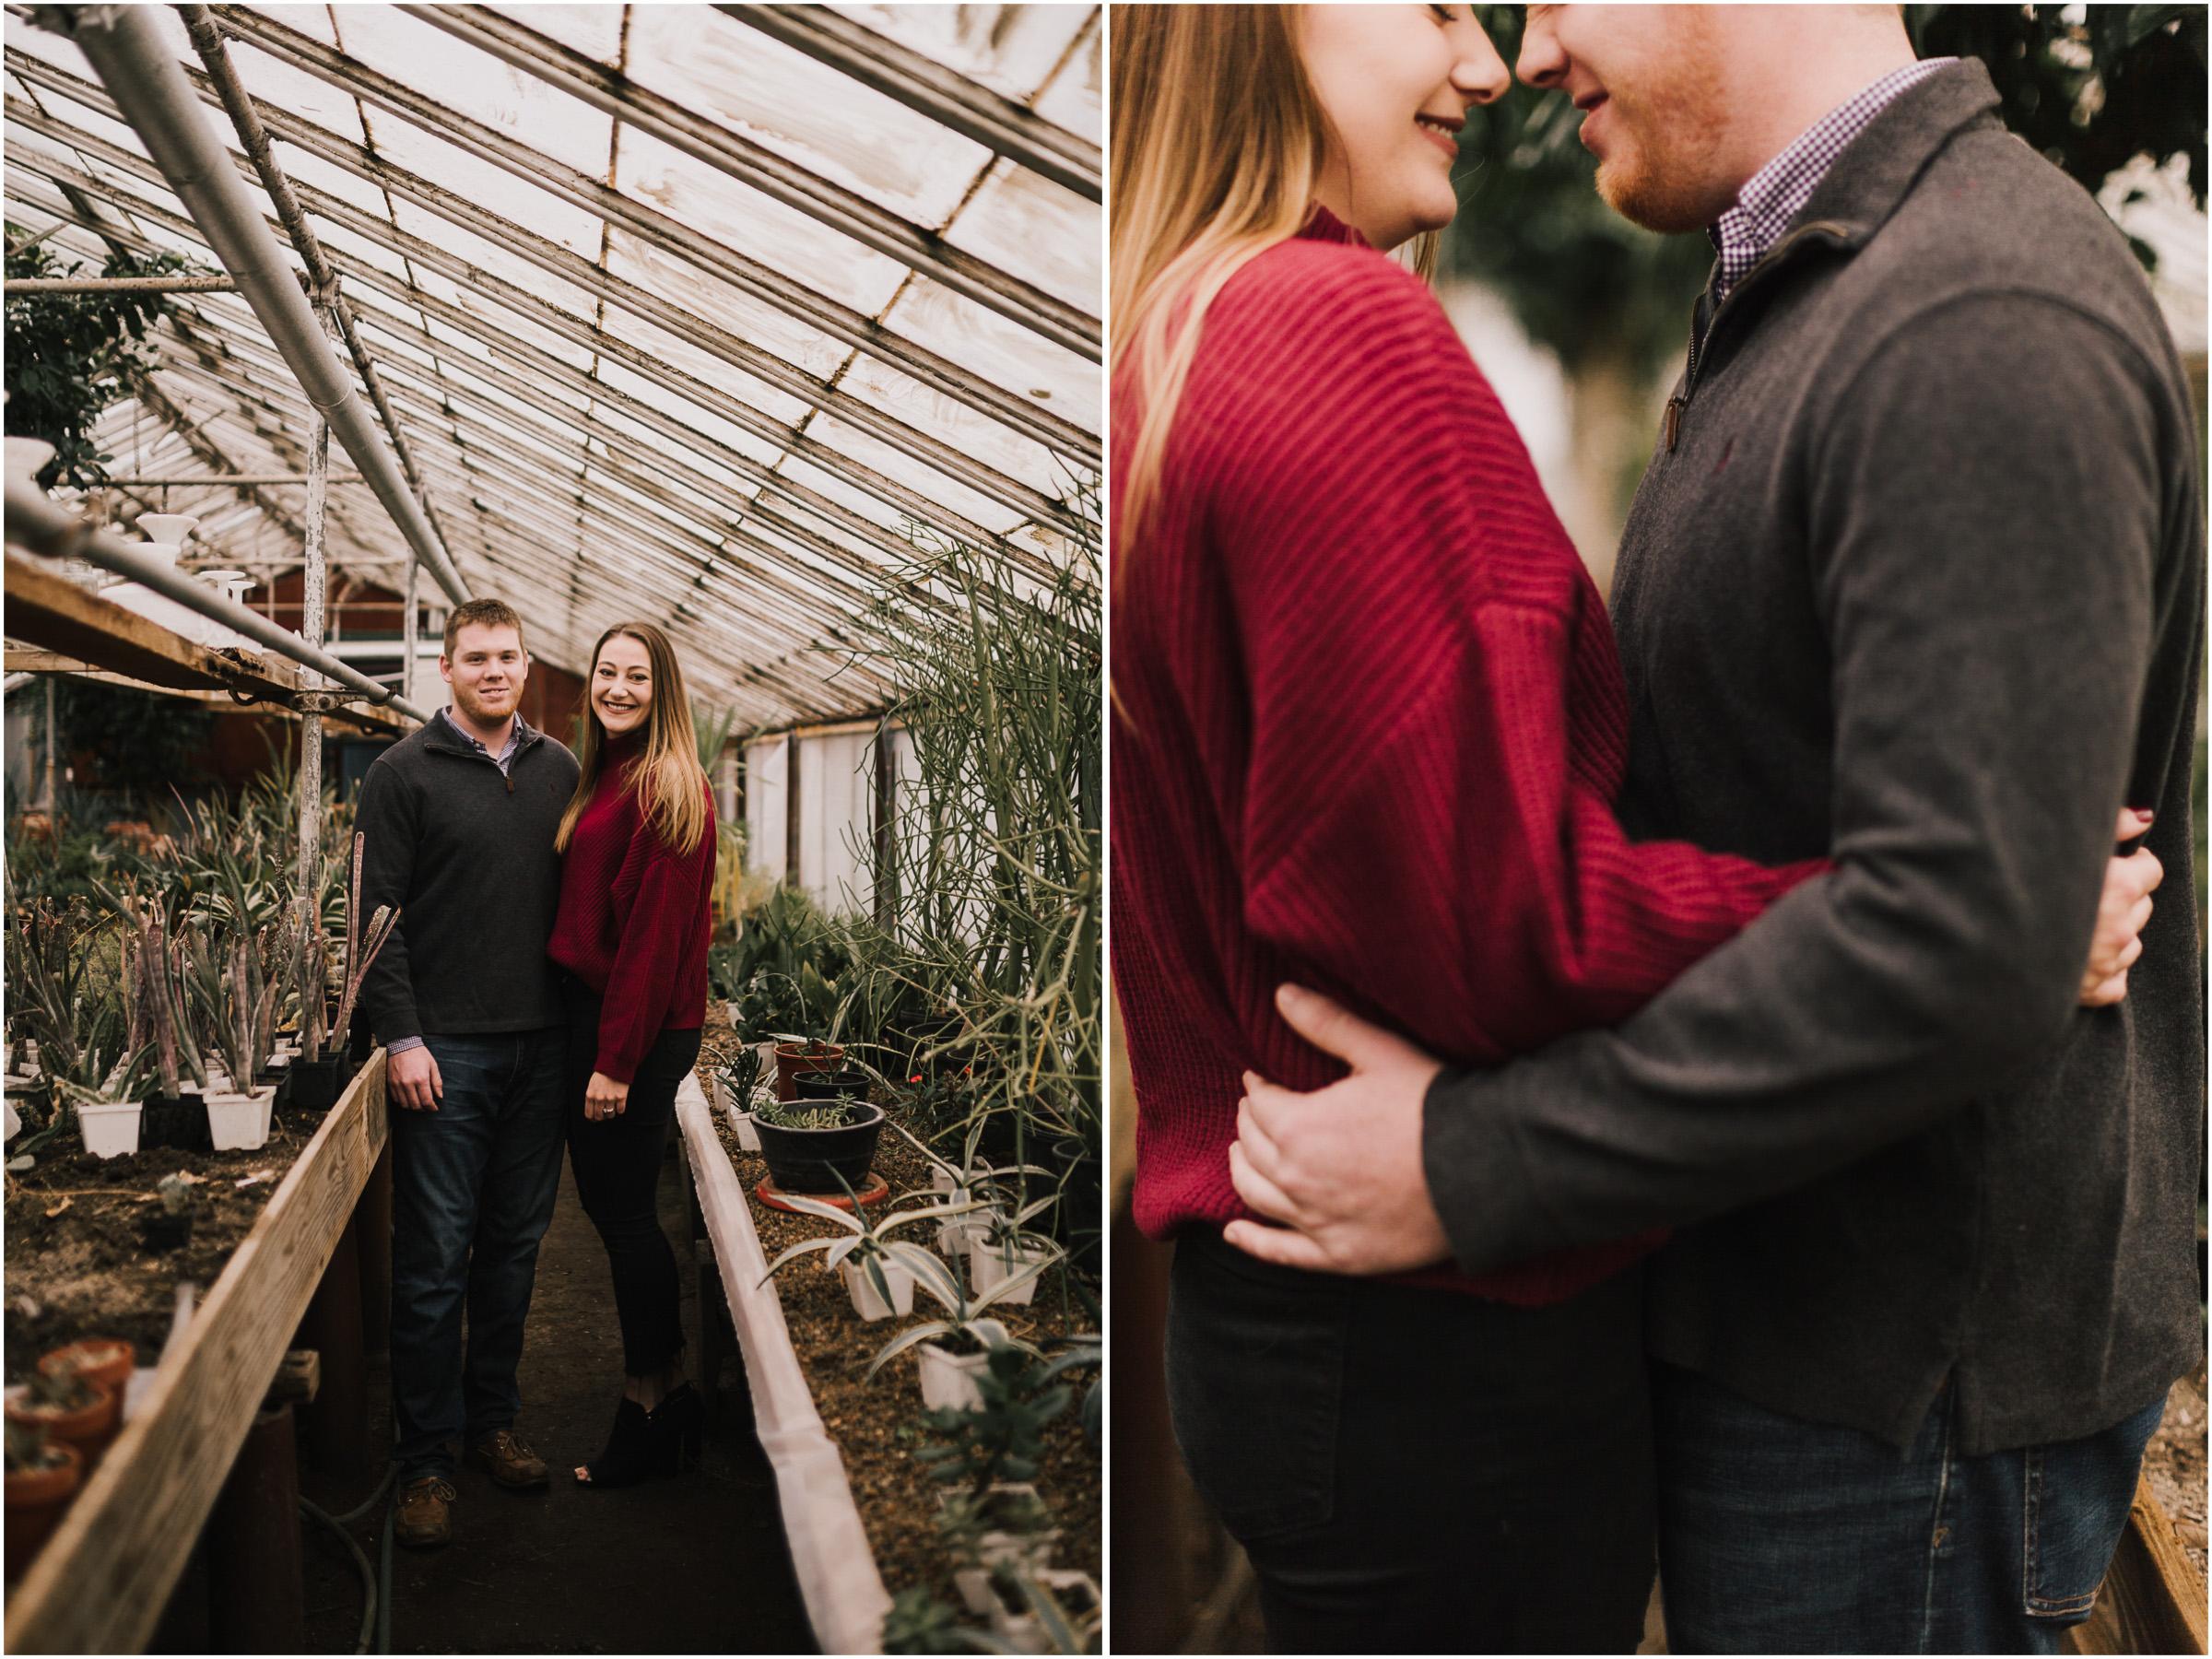 alyssa barletter photography johns greenhouse kansas city missouri brookside waldo engagement session winter-2.jpg